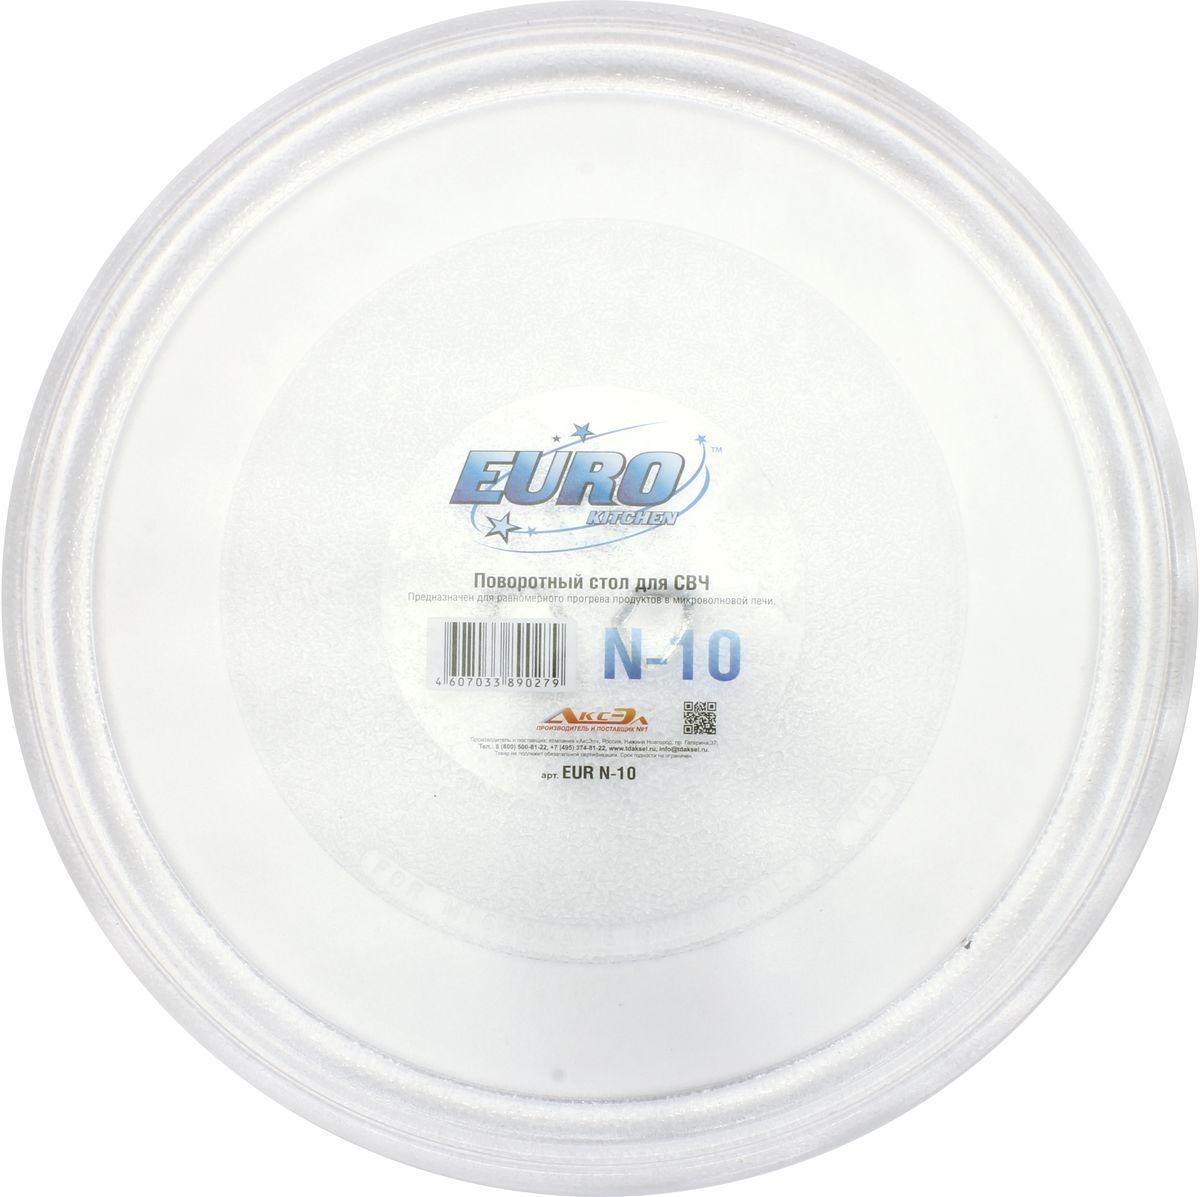 Euro Kitchen N-10 тарелка для СВЧN-10Универсальная тарелка N-10 для микроволновой печи с куплером. Диаметр тарелки 294 мм. Изготовлена из специального жаропрочного стекла. Предназначена для равномерного разогрева продуктов в микроволновой печи. Подходит для брендов: Aeg, Airhot, Amica, Ardo, Ariston, Asko, Atlanta, Aurora, Ava, Barazza, Bauknecht, Bbk, Beko, Bomann, Bork, Bosch, Brandt, Candy, Cata, Centek, Clatronic, Daewoo, De dietrich, Delfa, Electrolux, Elenberg, Ergo, Erisson, Eurotec, Fagor, Fimar, Foster, Franke, Fulgor, Fusion, Gaggenau, Gastrorag, Goldstar, Gorenje, Hankel, Hansa, Hilton, Horizont, Hurakan, Hyundai, Ilve, Indesit, Kaiser, Kenmore, Kenwood, Korting, Kuppersberg, Kuppersbusch, Kamark, Keran, Lg, Liberton, Liberty, Maxwell, Menumaster, Midea, Miele, Moulinex, Mystery, Neff, Oursson, Panasonic, Proficook, Rainford, Redmond, Rolsen, Samsung, Saturn, Scarlett, Sencor, Sharp, Siemens, Simfer, Sinbo, Sirman, Smeg, Supra, Teka, Thomson, Toshiba, V-zug, Vasko, Vimar, Vitek, Vr, Weissgauff,...